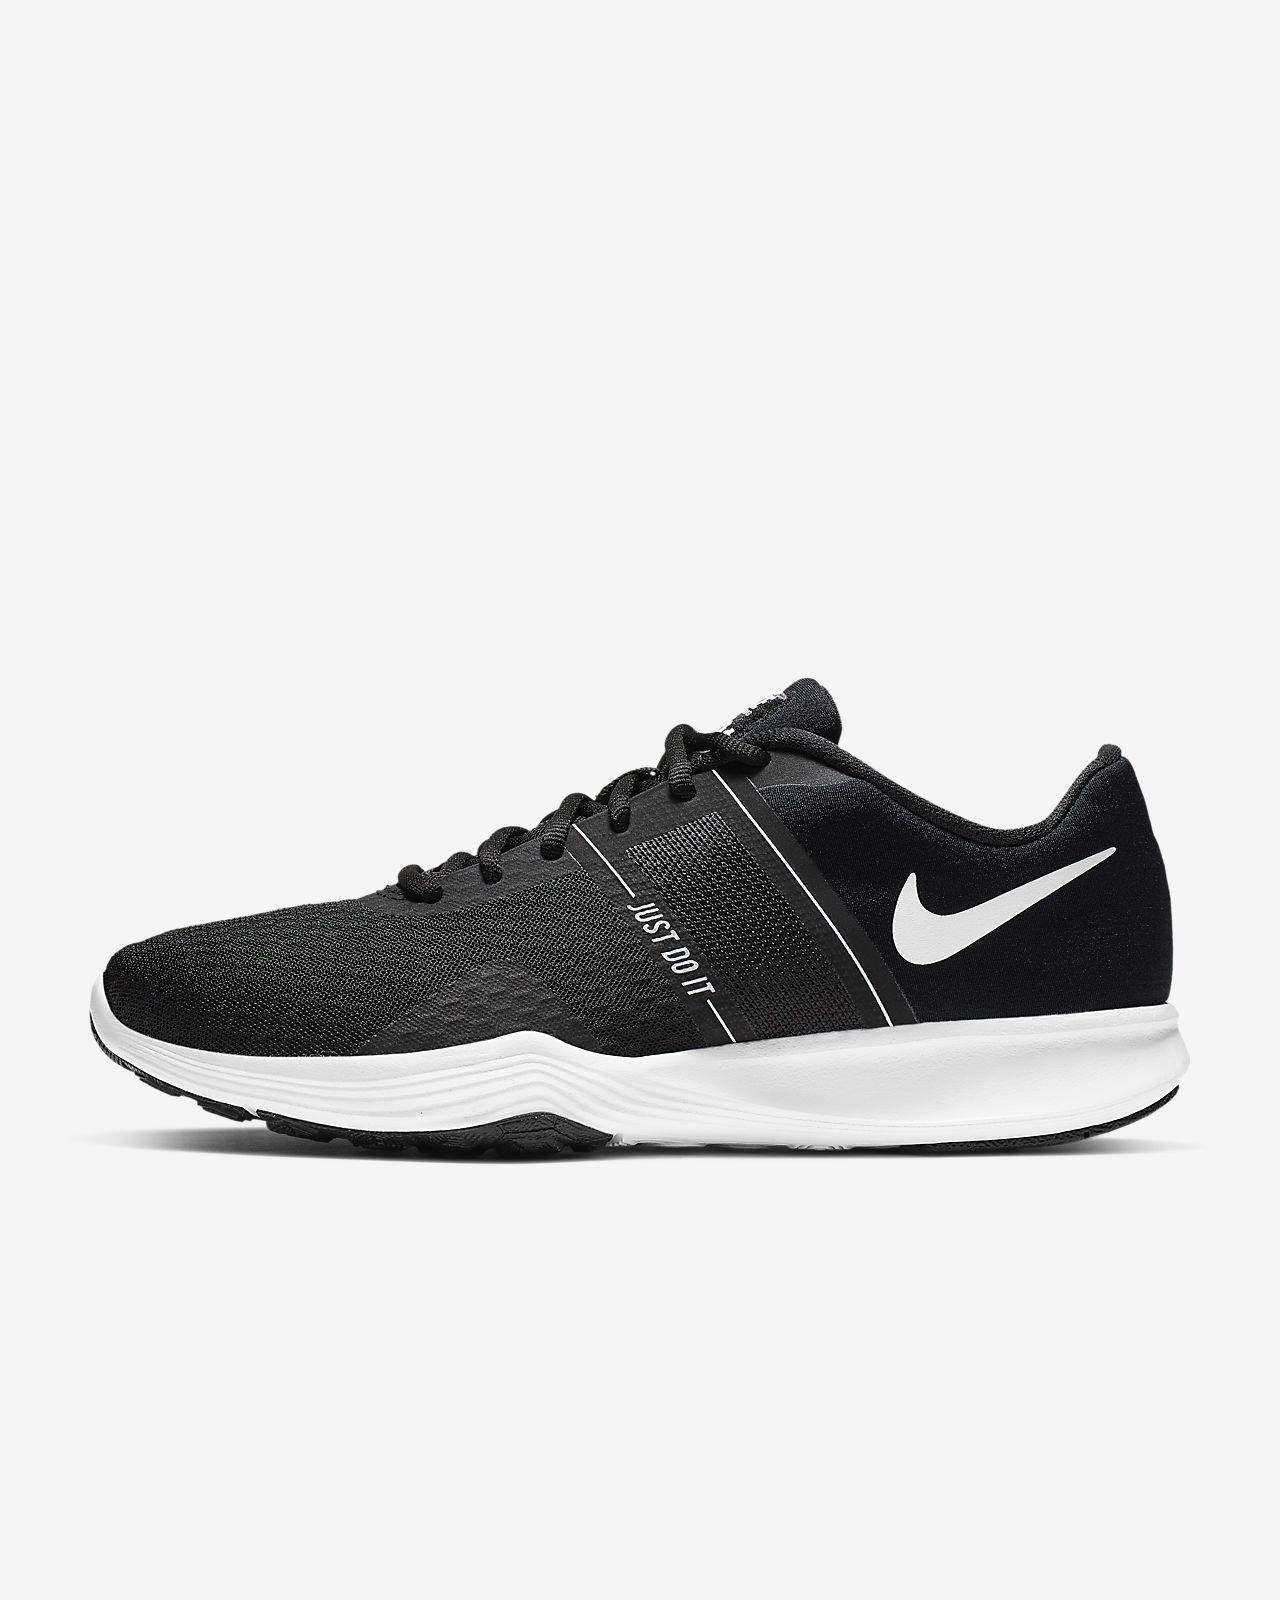 Dámská teniska Nike City Trainer 2